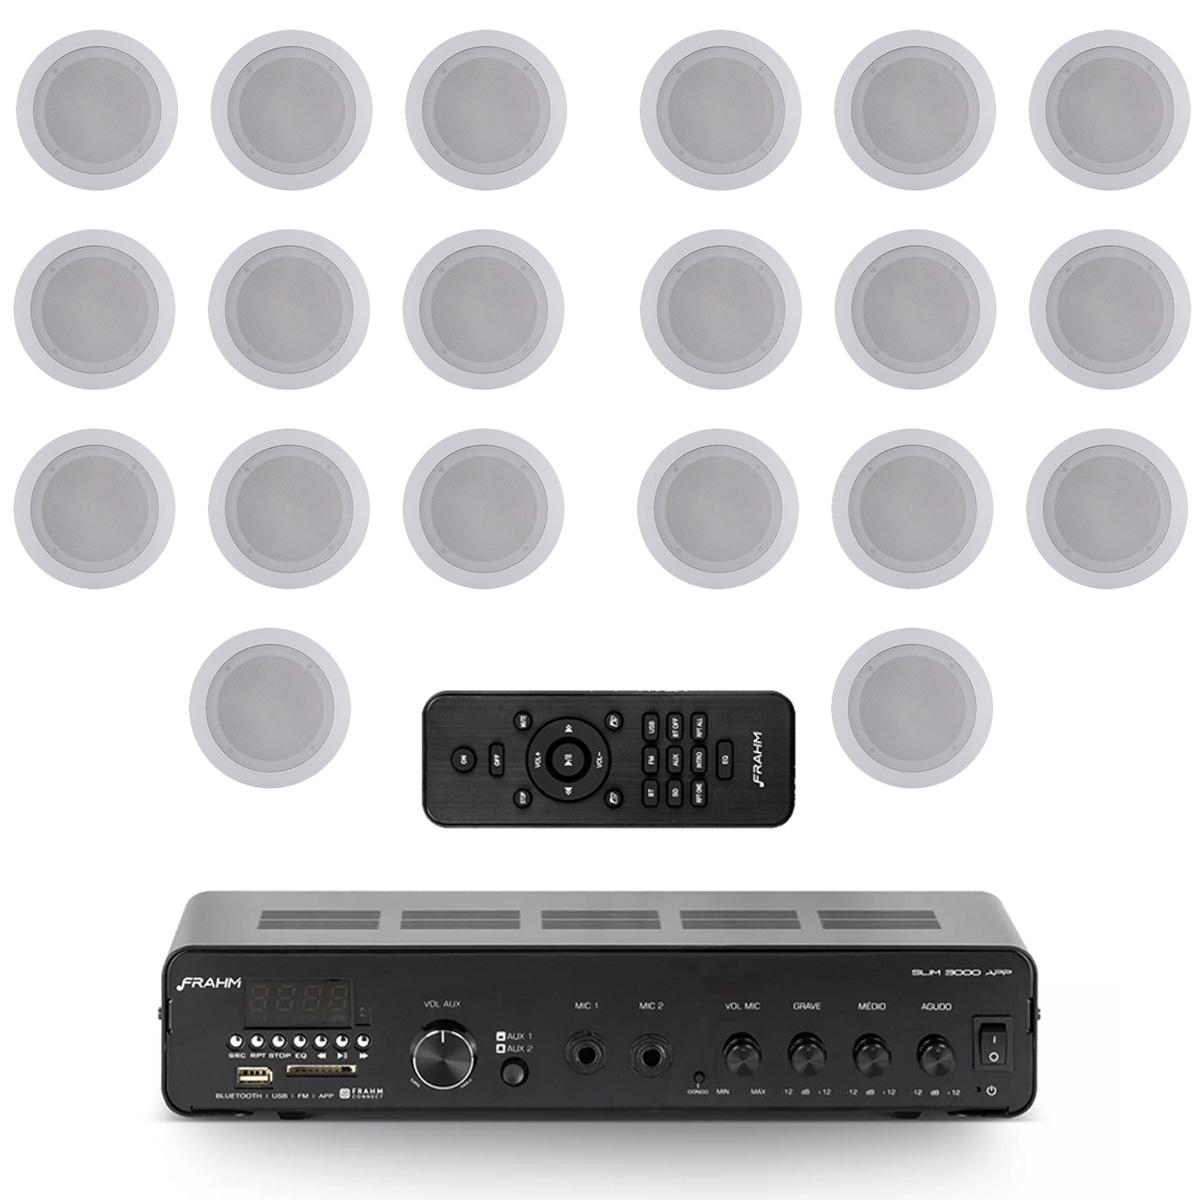 Kit 20 arandelas + amplificador USB Frahm Slim3000APP